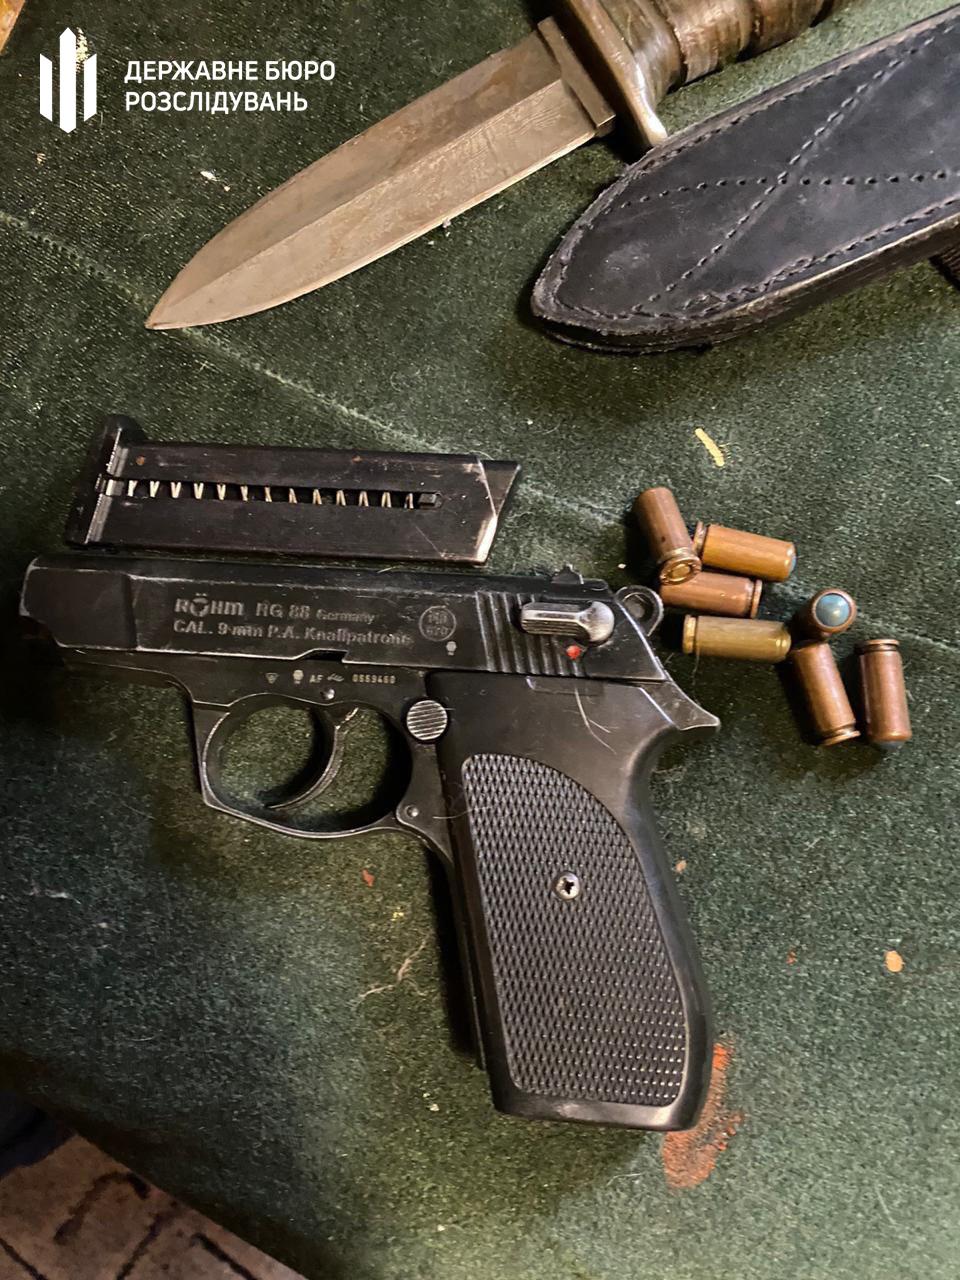 Бориспільщина: у Чорновол при обшуку знайшли вогнепальну та холодну зброю -  - 004 0